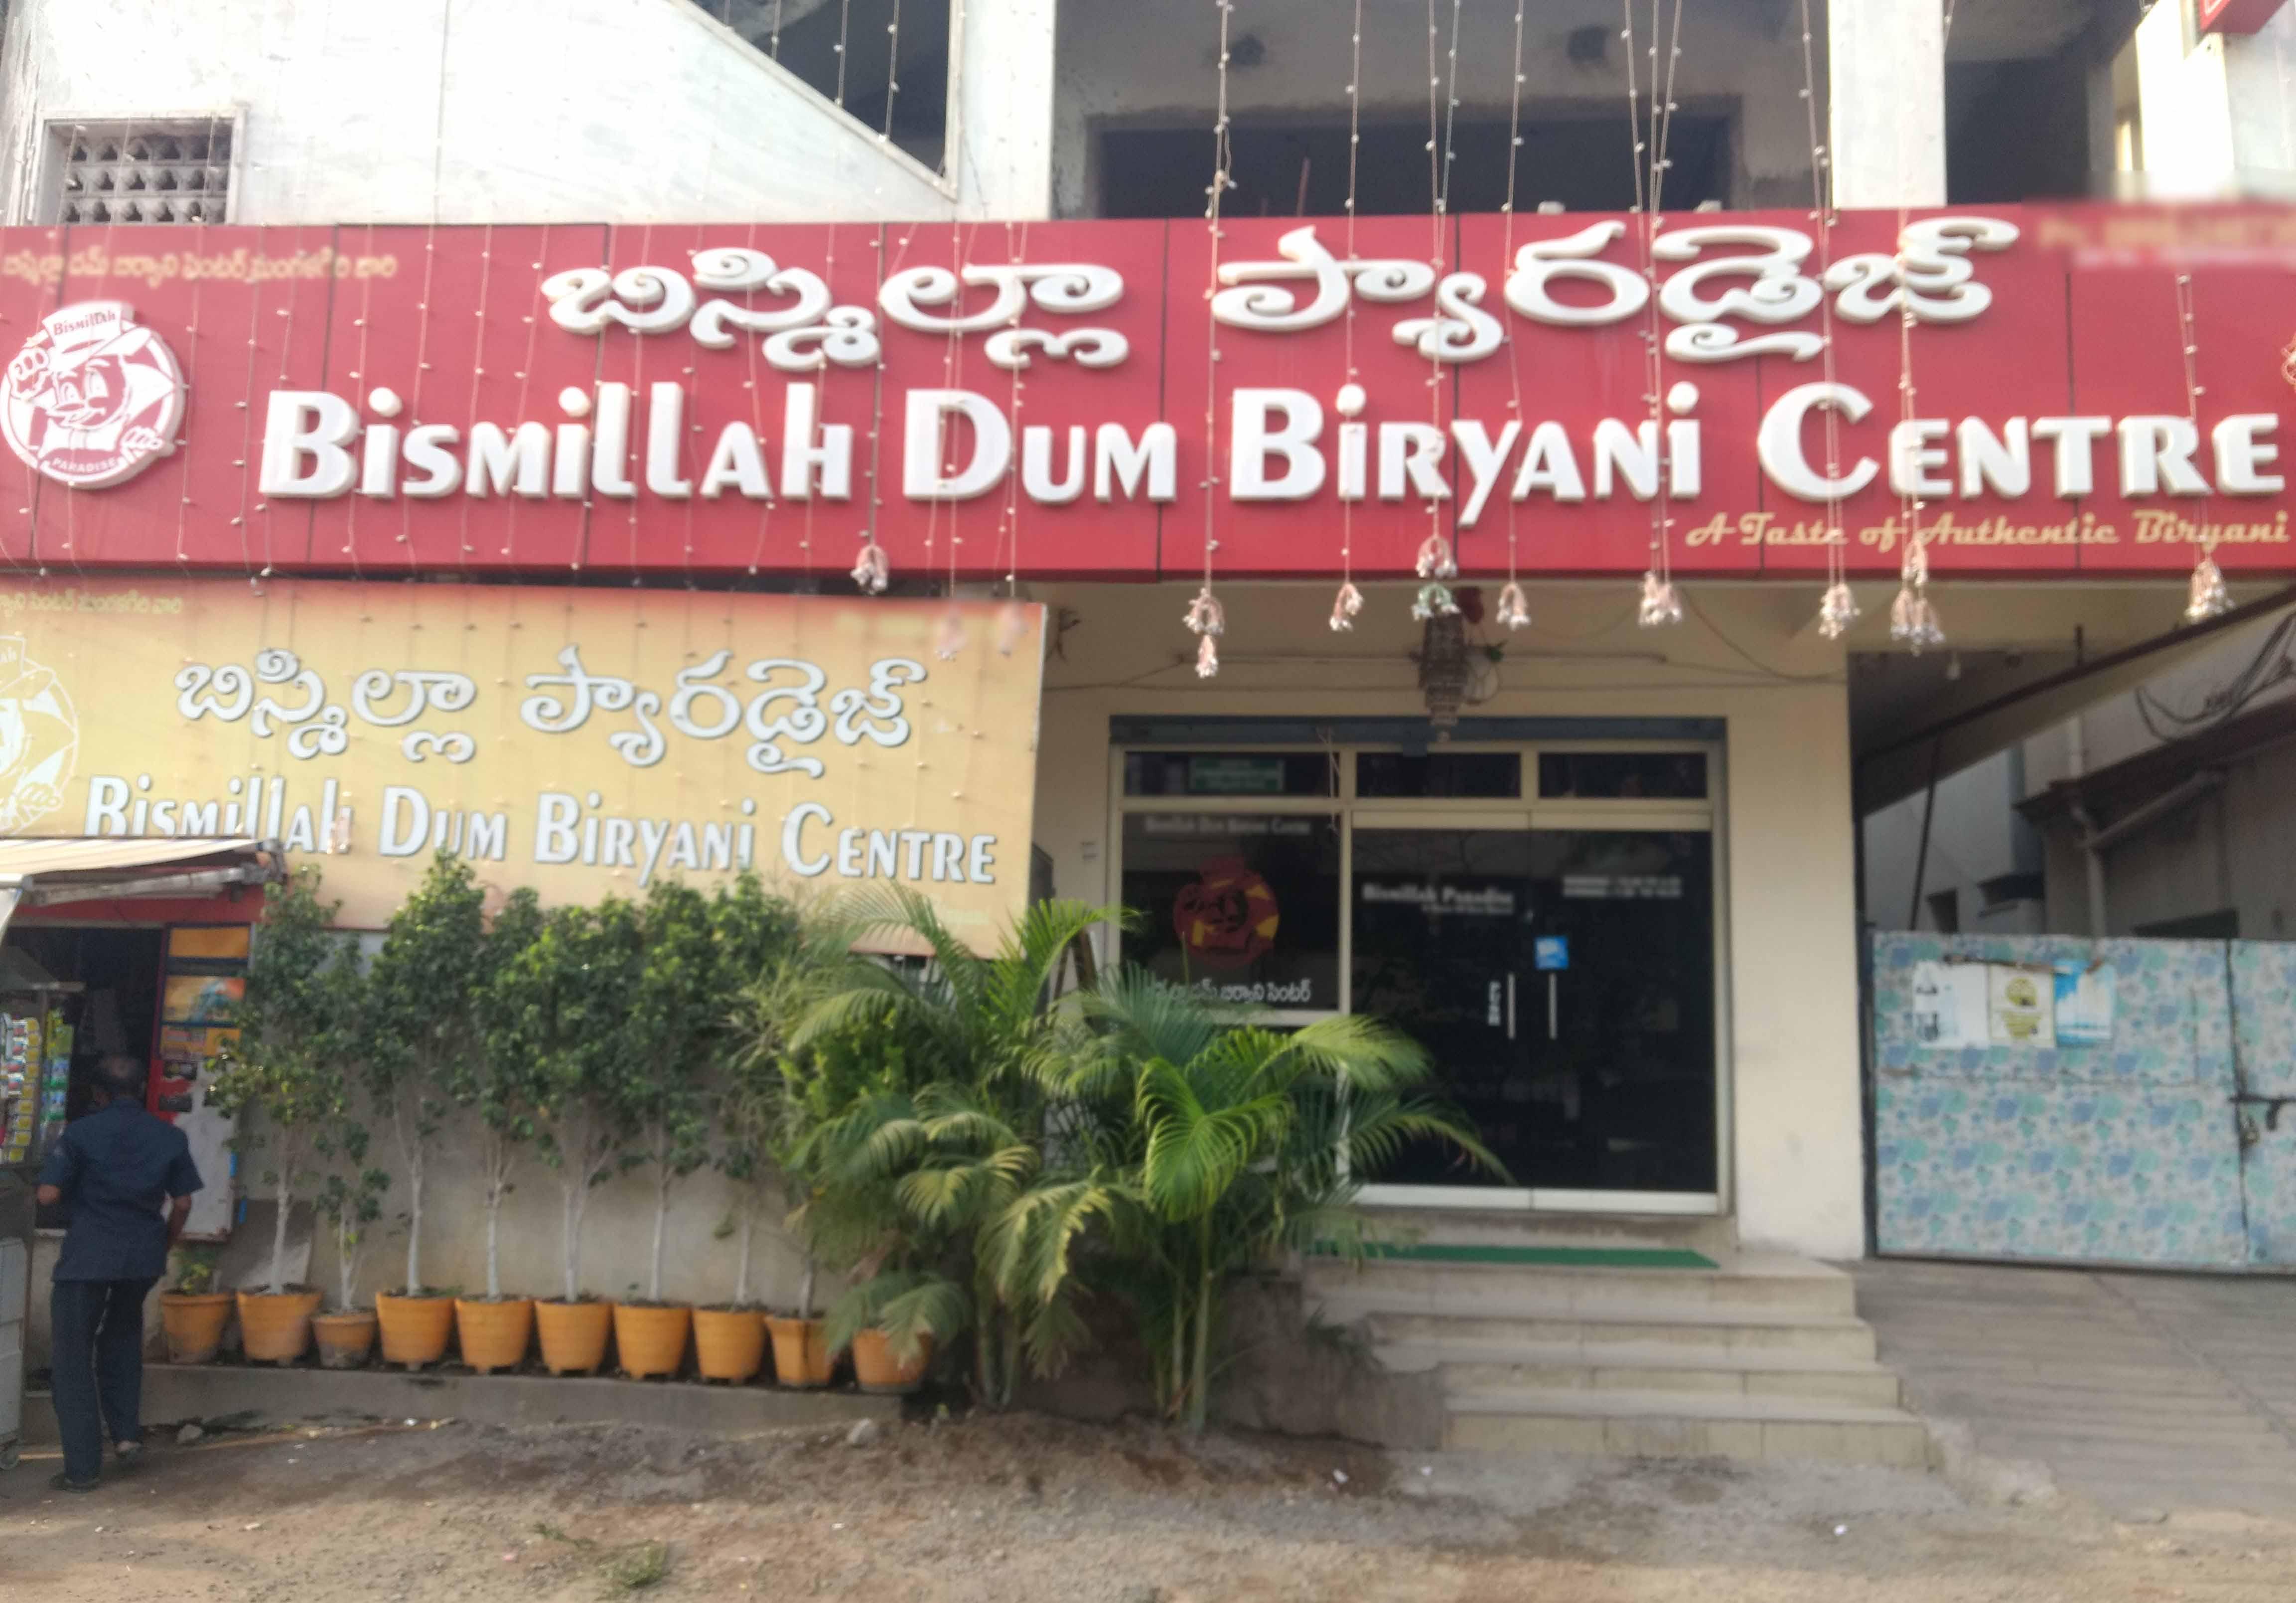 Bismillah Dum Biryani Centre - Labbipet - Vijayawada Image